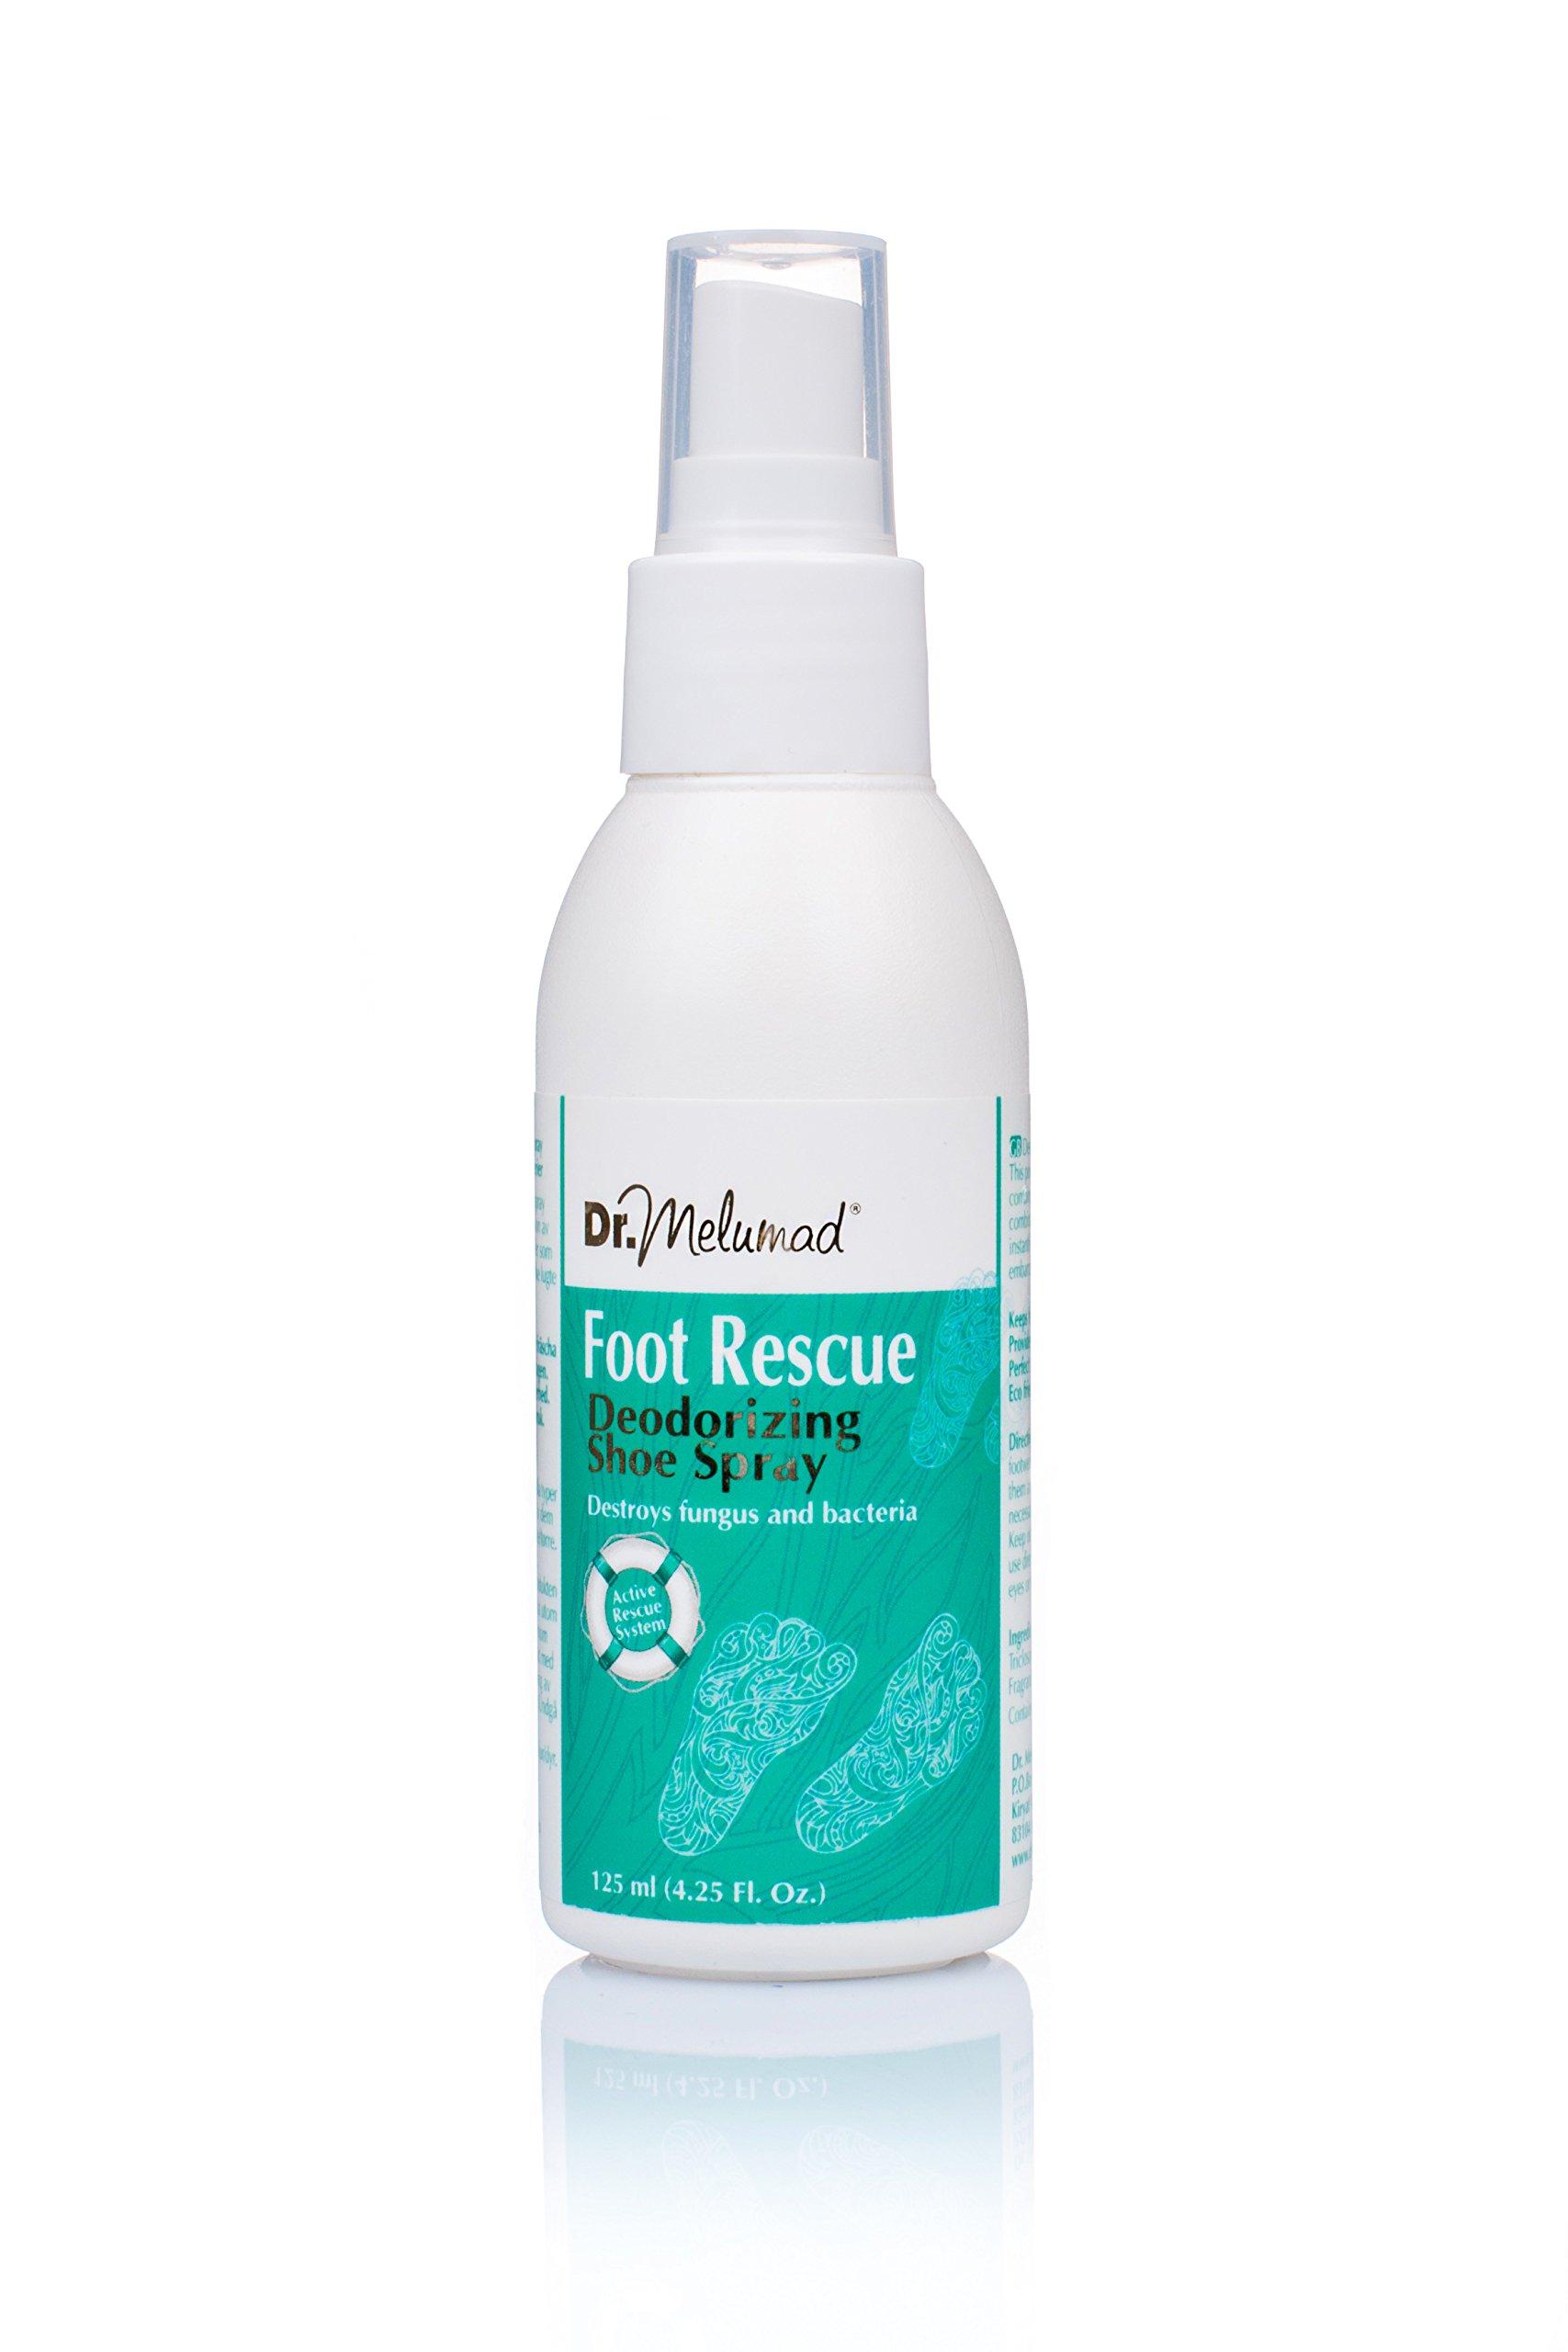 Deodorizing Shoe Spray, Anti Shoe Fungus, Anti Shoe Bacteria, Eliminate Shoe Offensive, Eliminate Shoe Embarrassing Shoes Odors, 4.25 Fl.Oz.